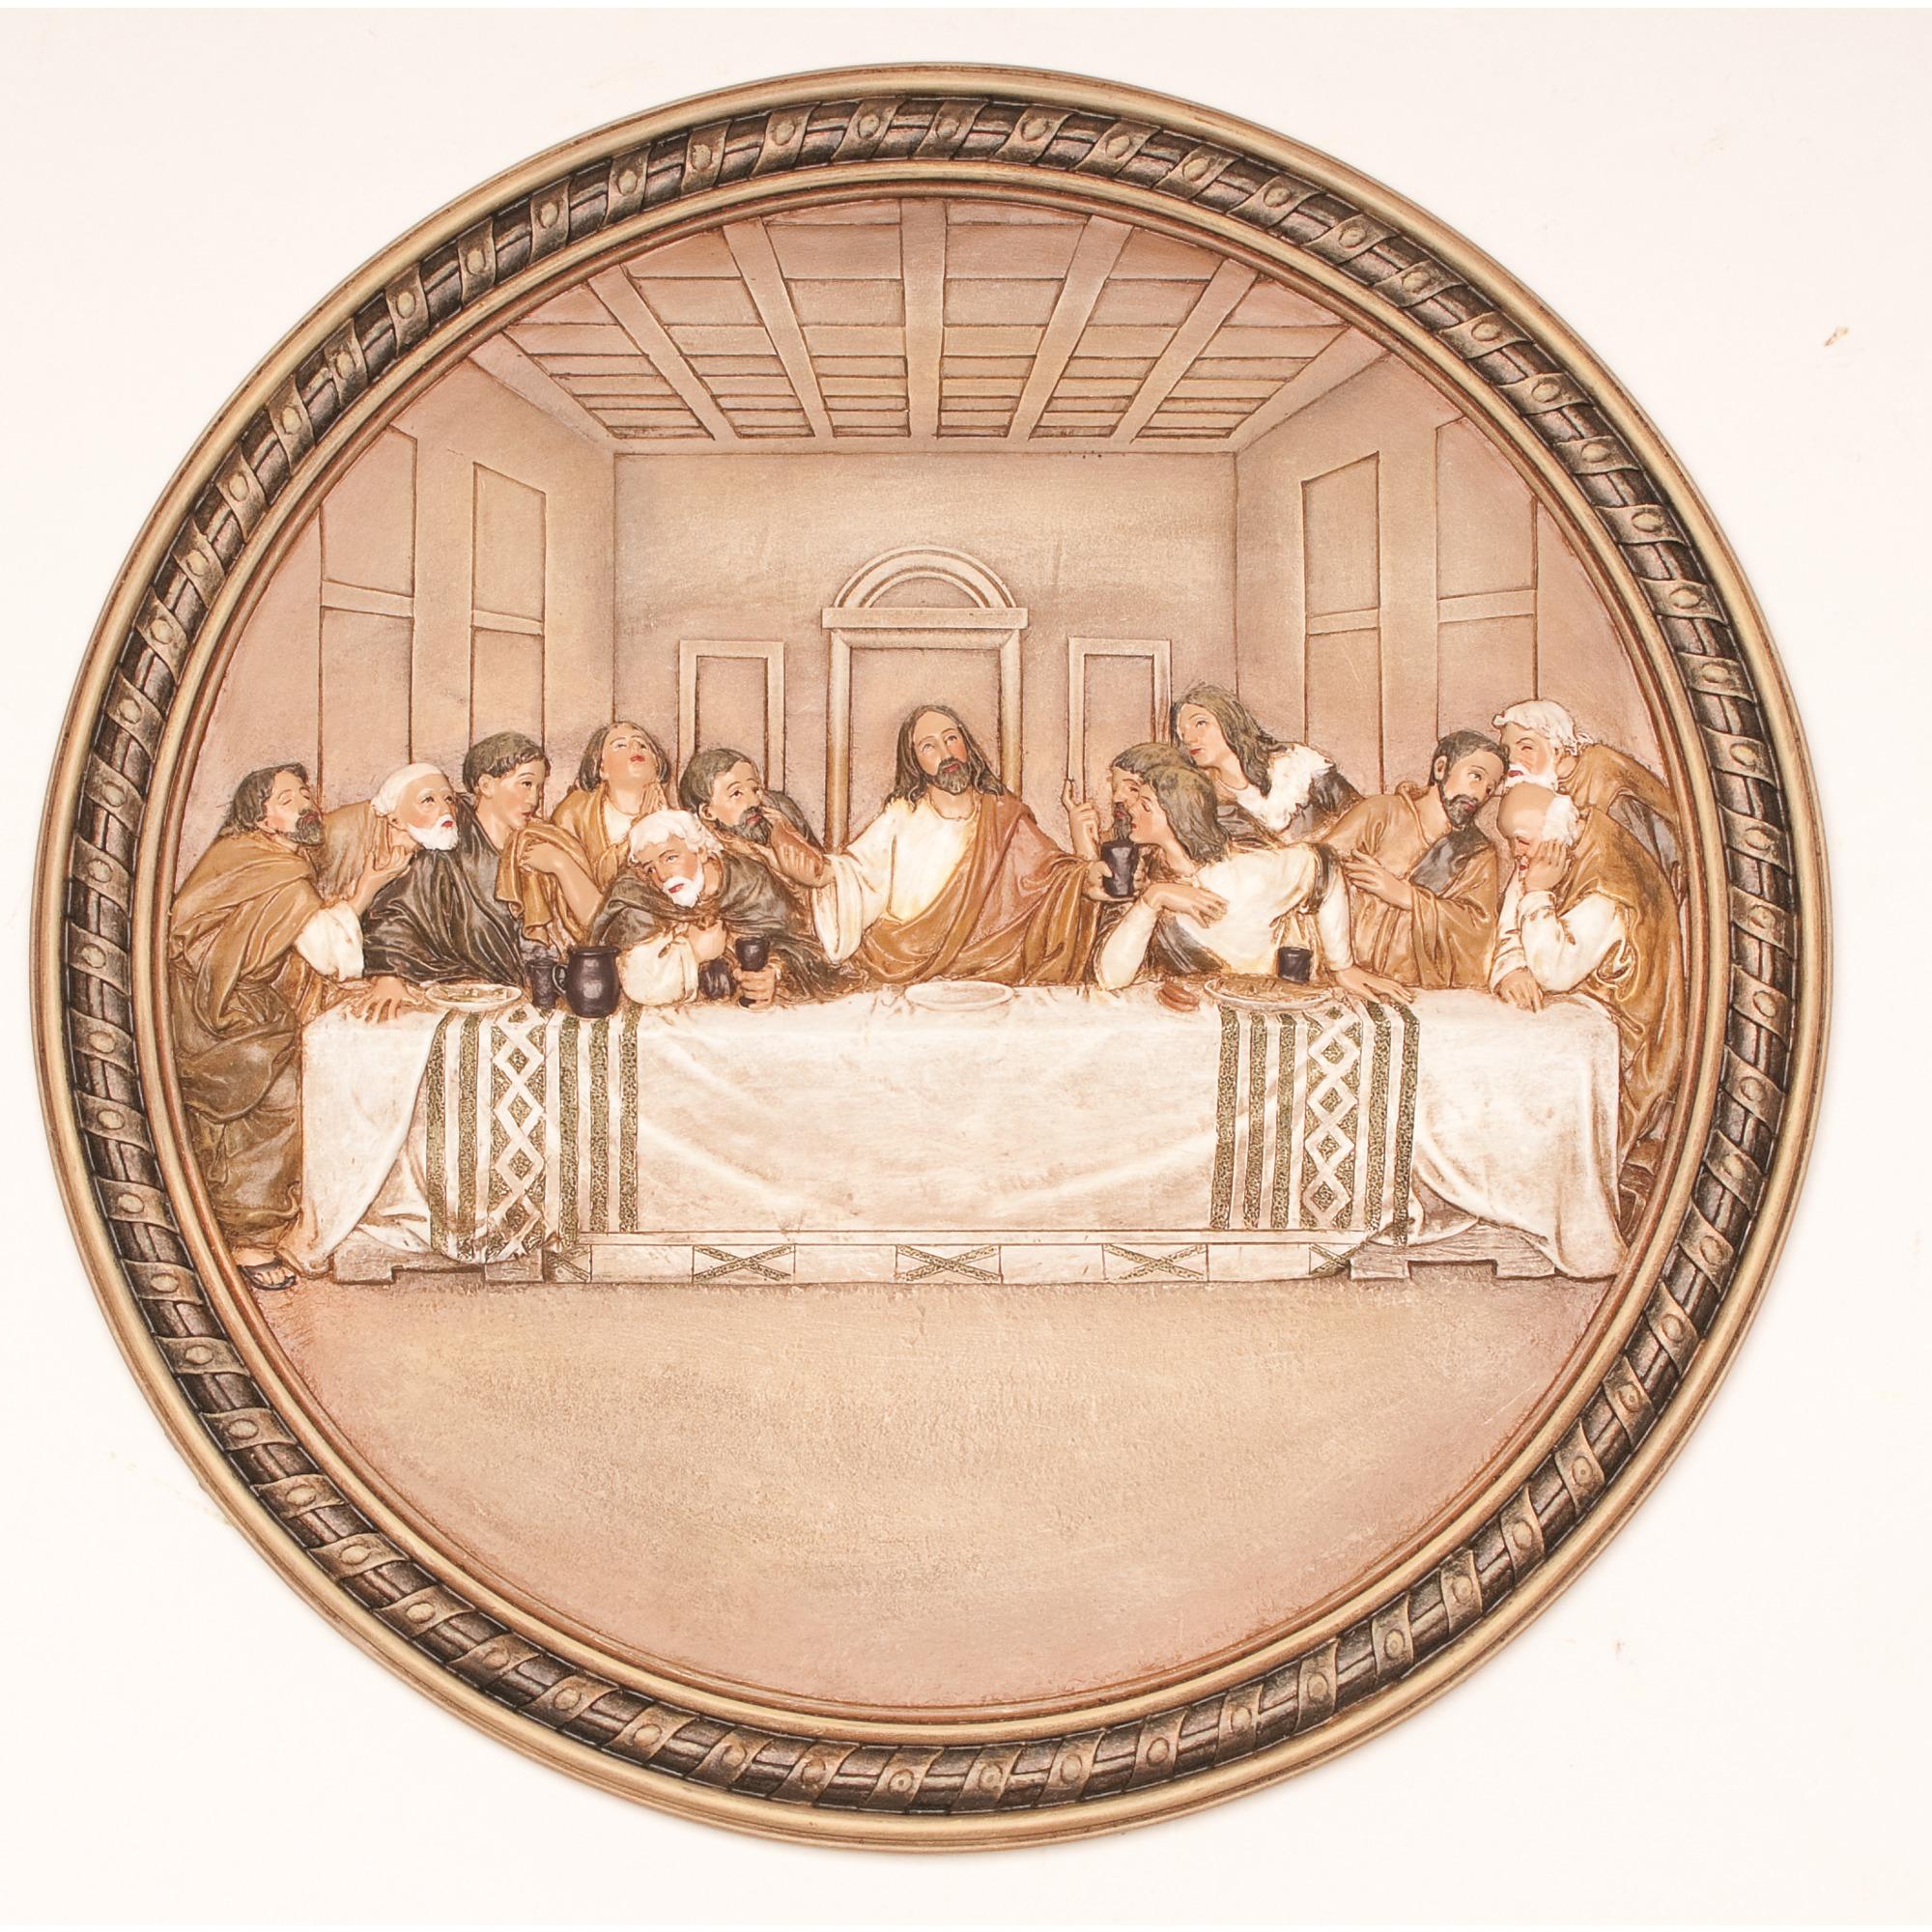 sc 1 st  The Catholic Company & Last Supper Decorative Plate | The Catholic Company